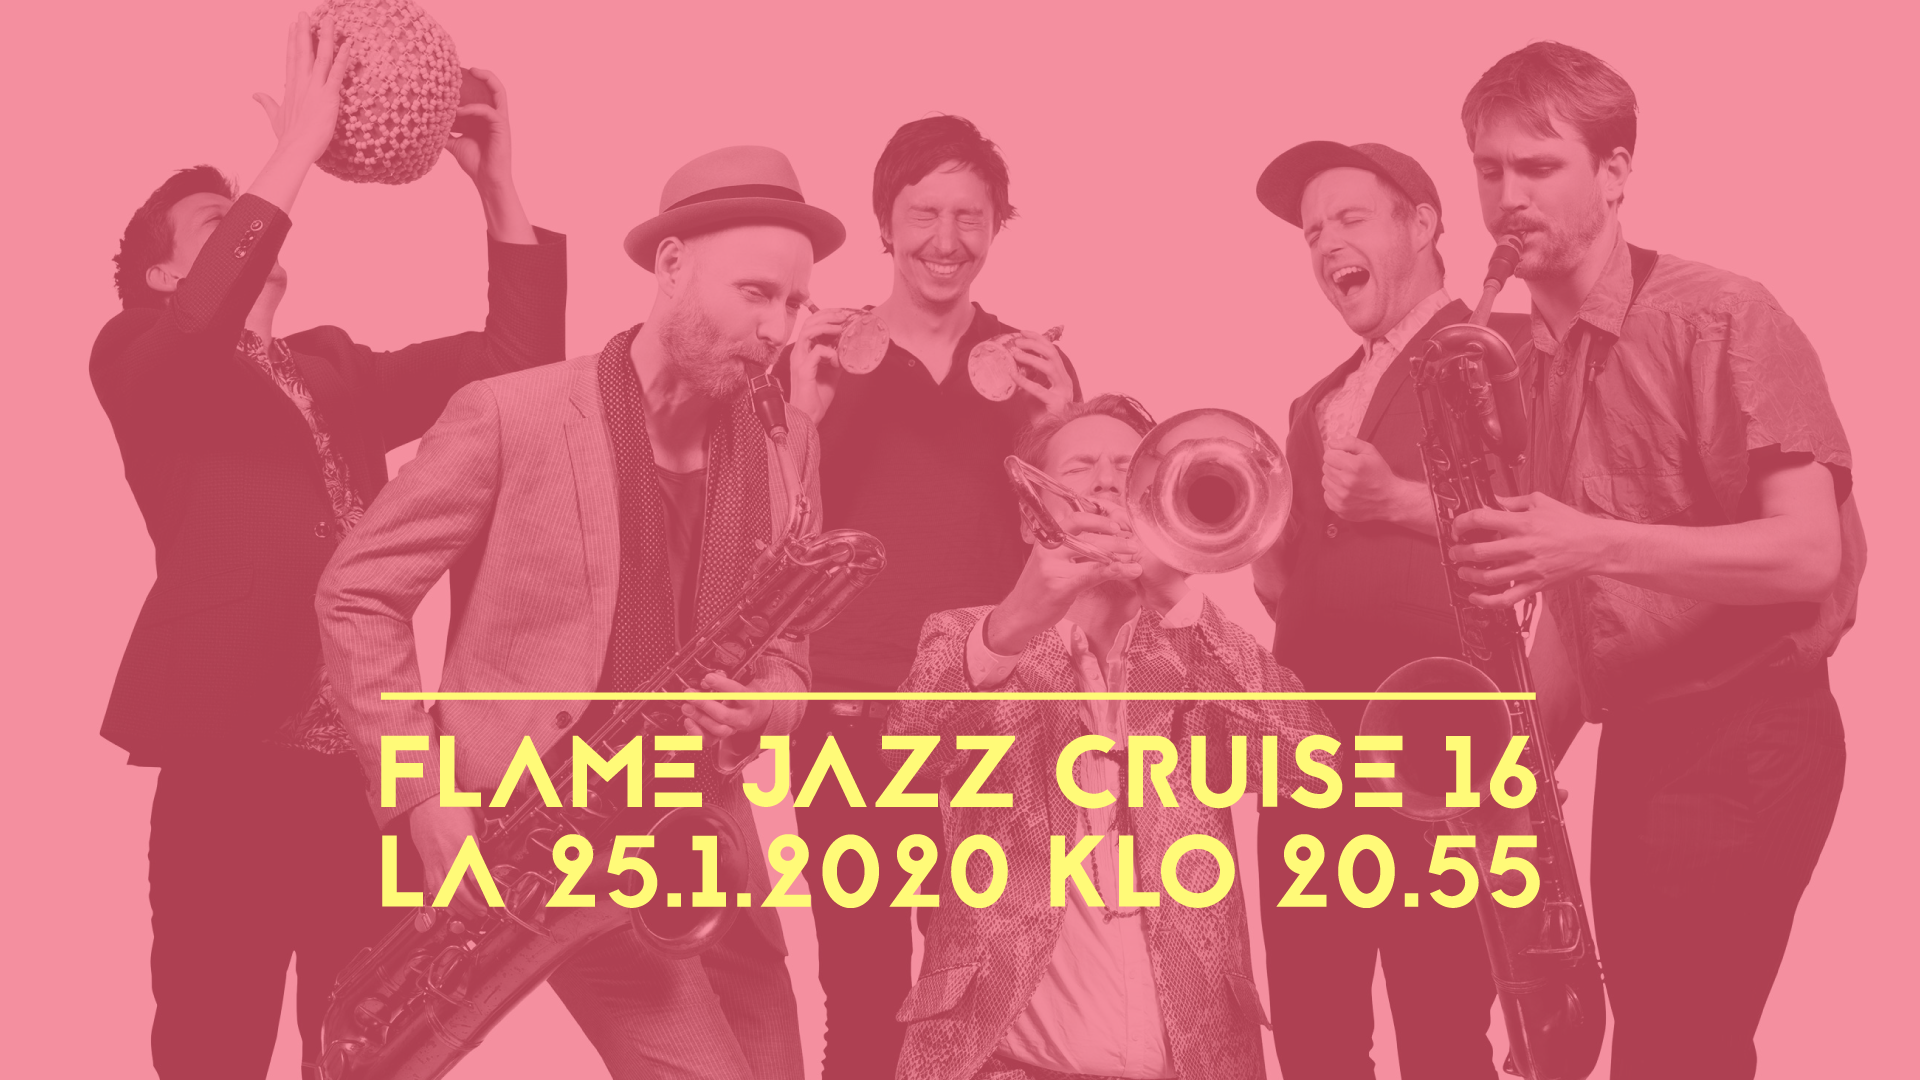 flamejazz-2020-cruise-kevat-fbpost-03